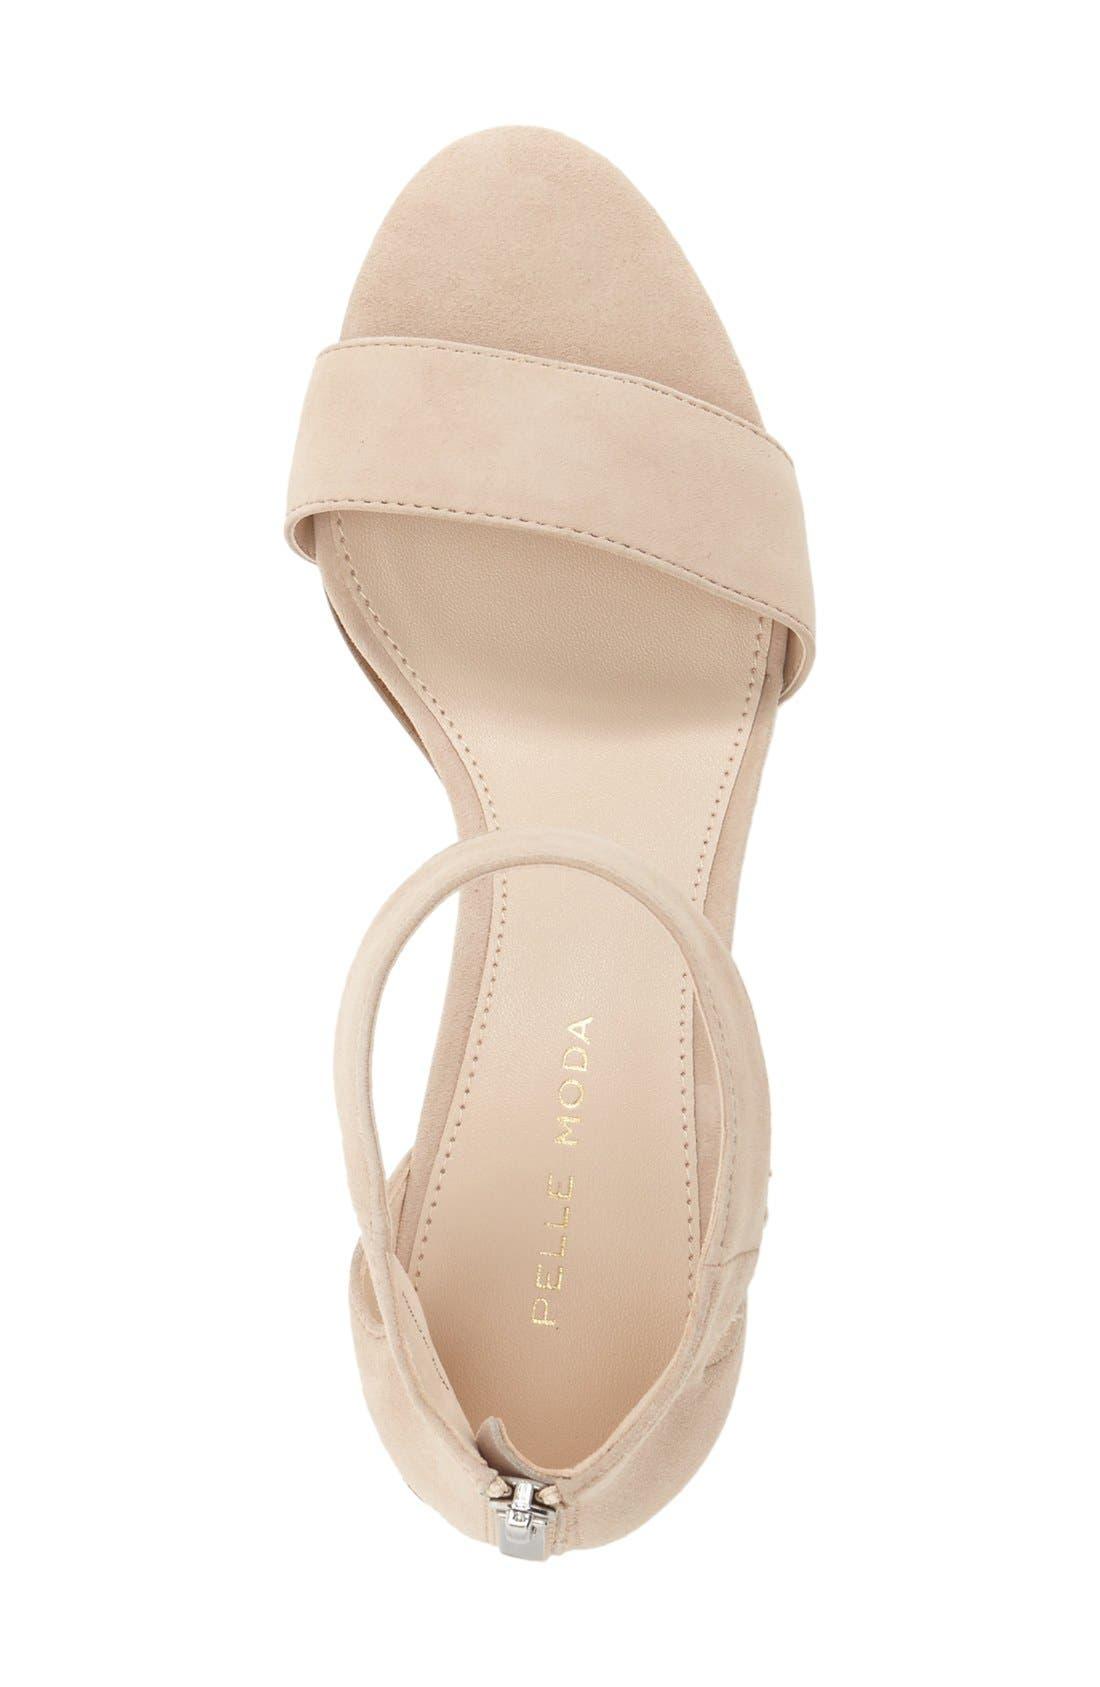 Pella Moda 'Urban' Block Heel Sandal,                             Alternate thumbnail 9, color,